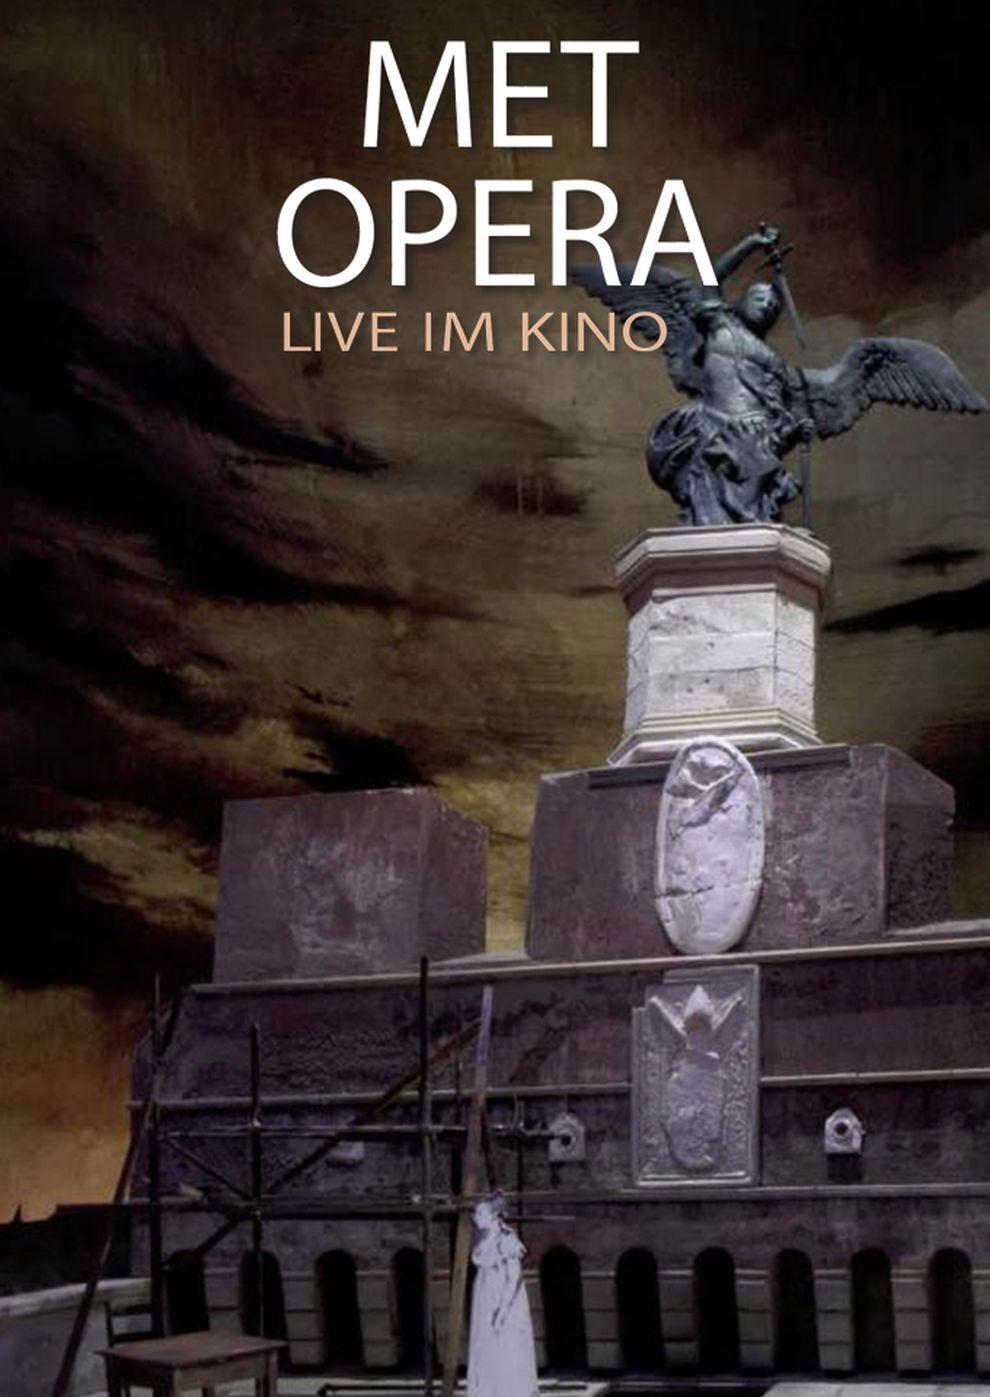 Met Opera 2017/18: Tosca (Puccini) (Poster)